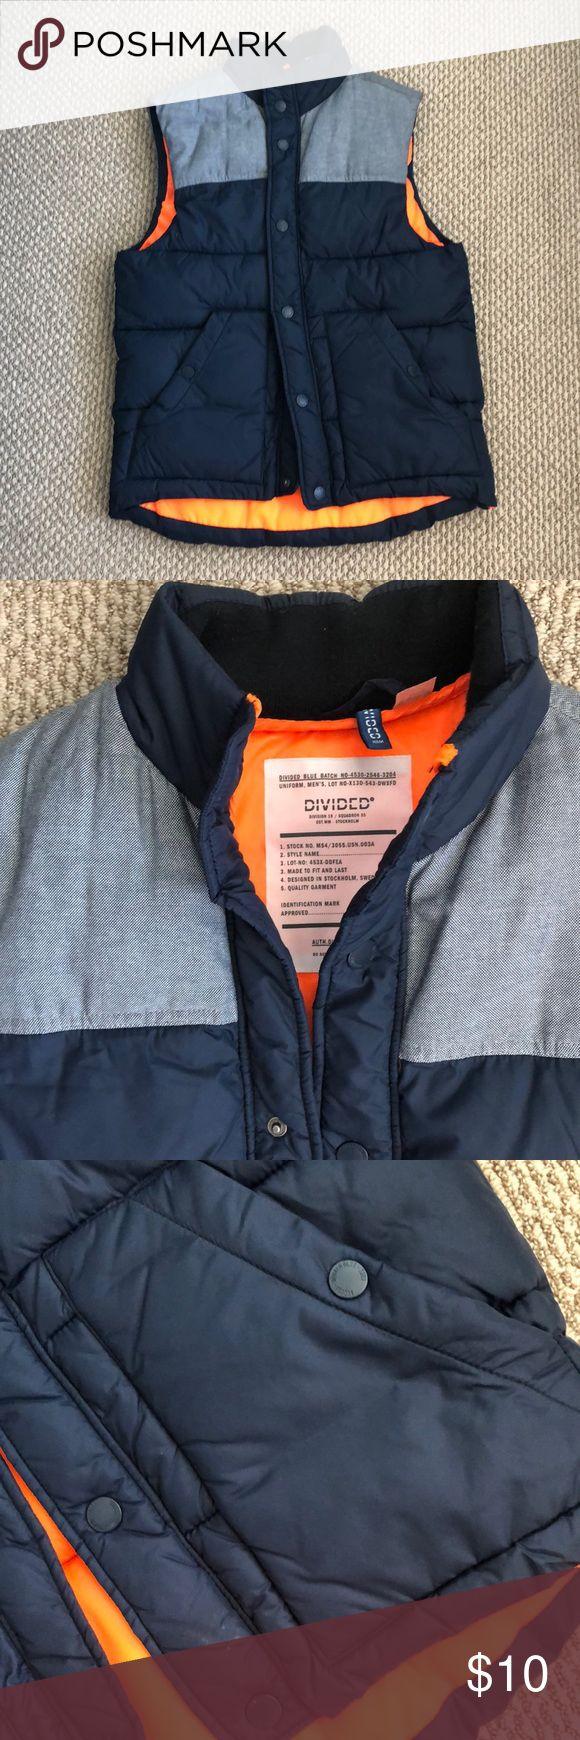 H&M Men's puffer vest Navy blue button up vest with bright